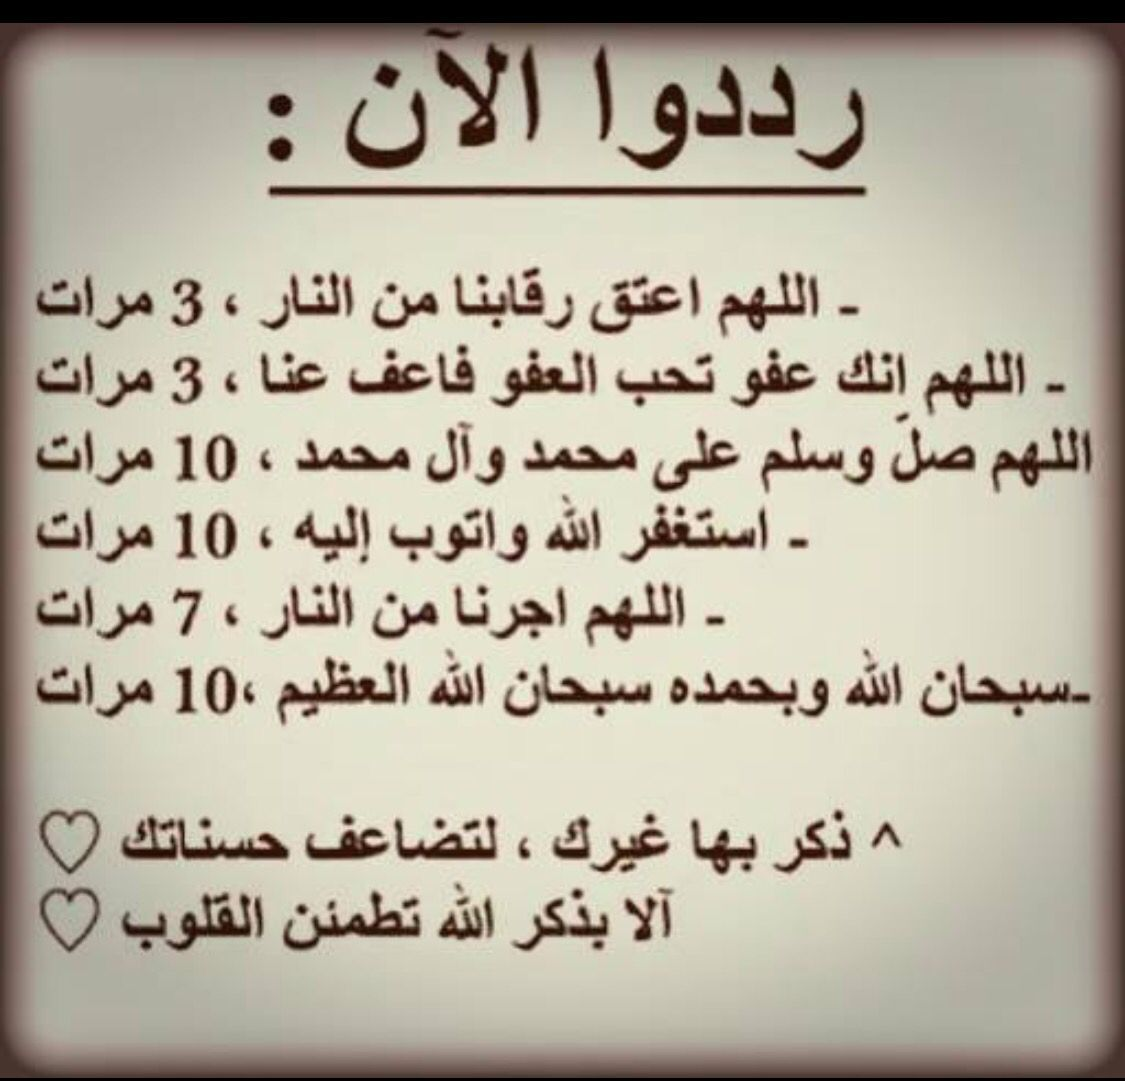 رددوا الان Islamic Phrases Islamic Quotes Duaa Islam